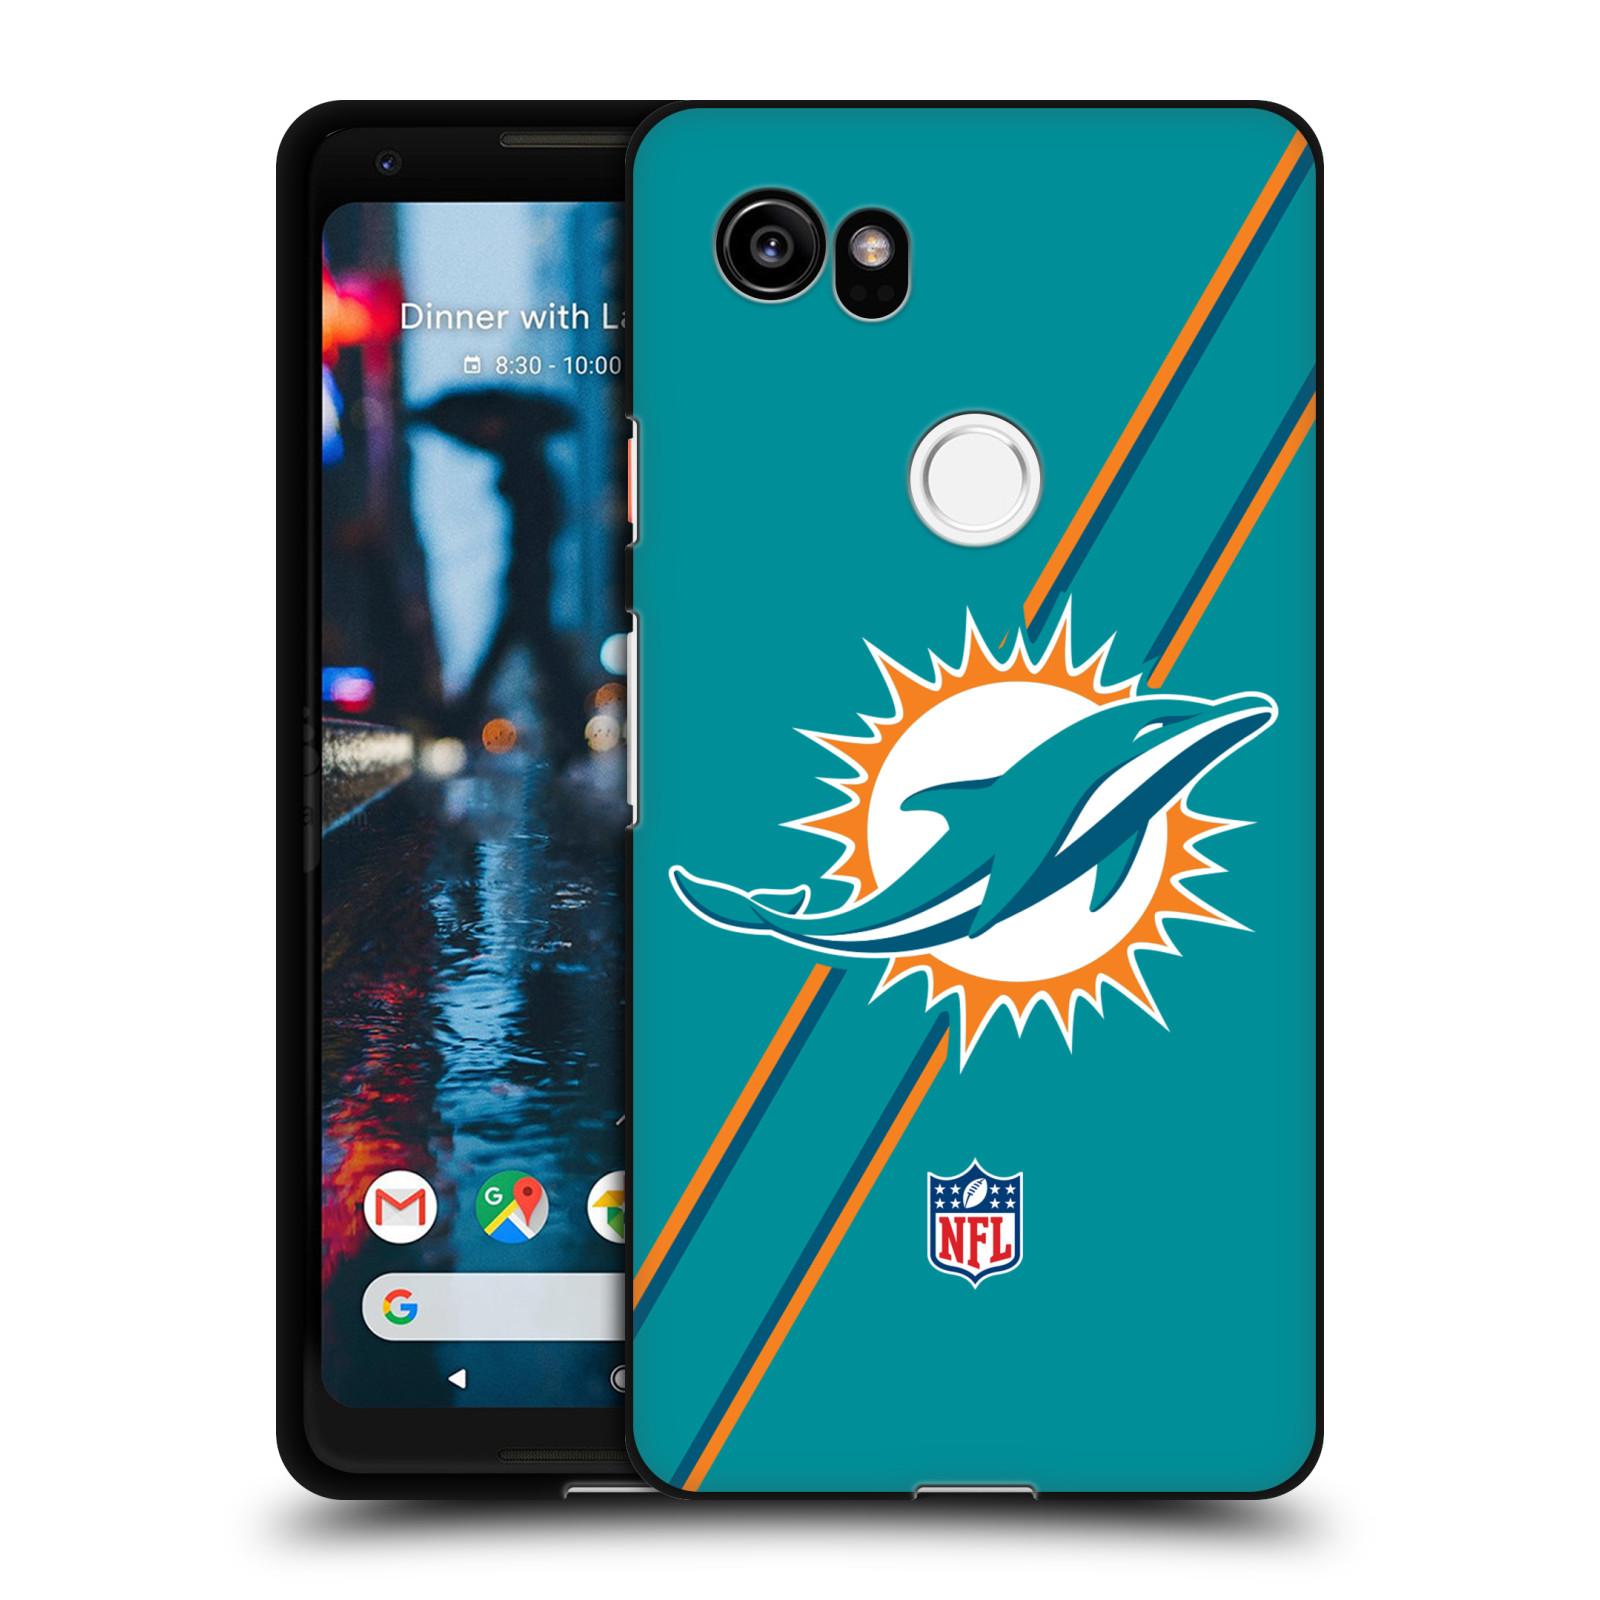 OFFICIAL-NFL-MIAMI-DOLPHINS-LOGO-BLACK-SOFT-GEL-CASE-FOR-GOOGLE-PHONES